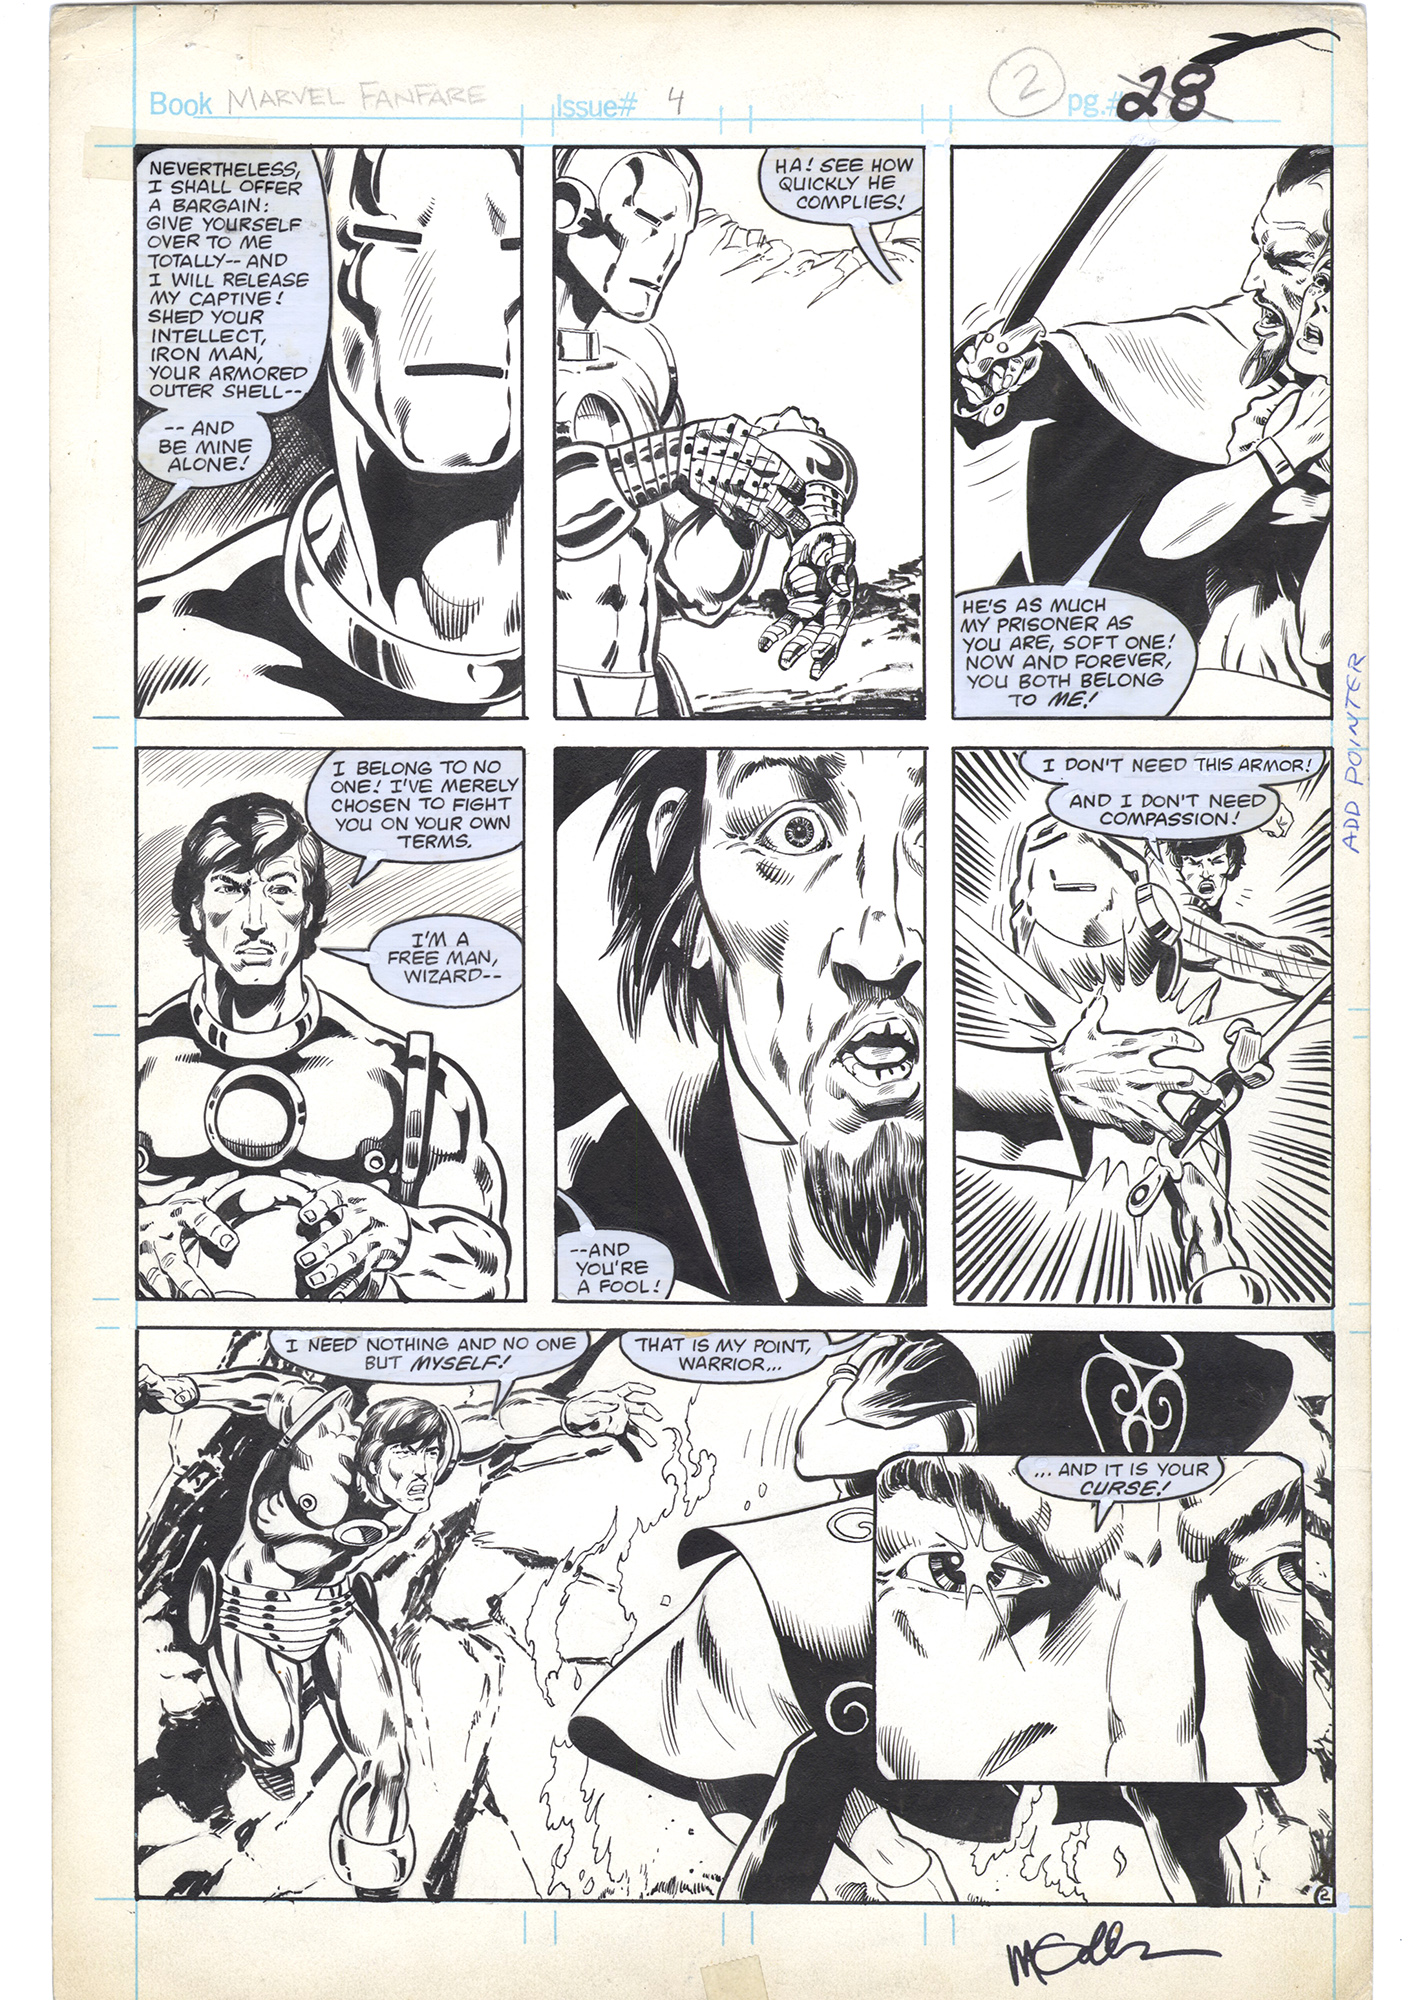 Marvel Fanfare #4 p2